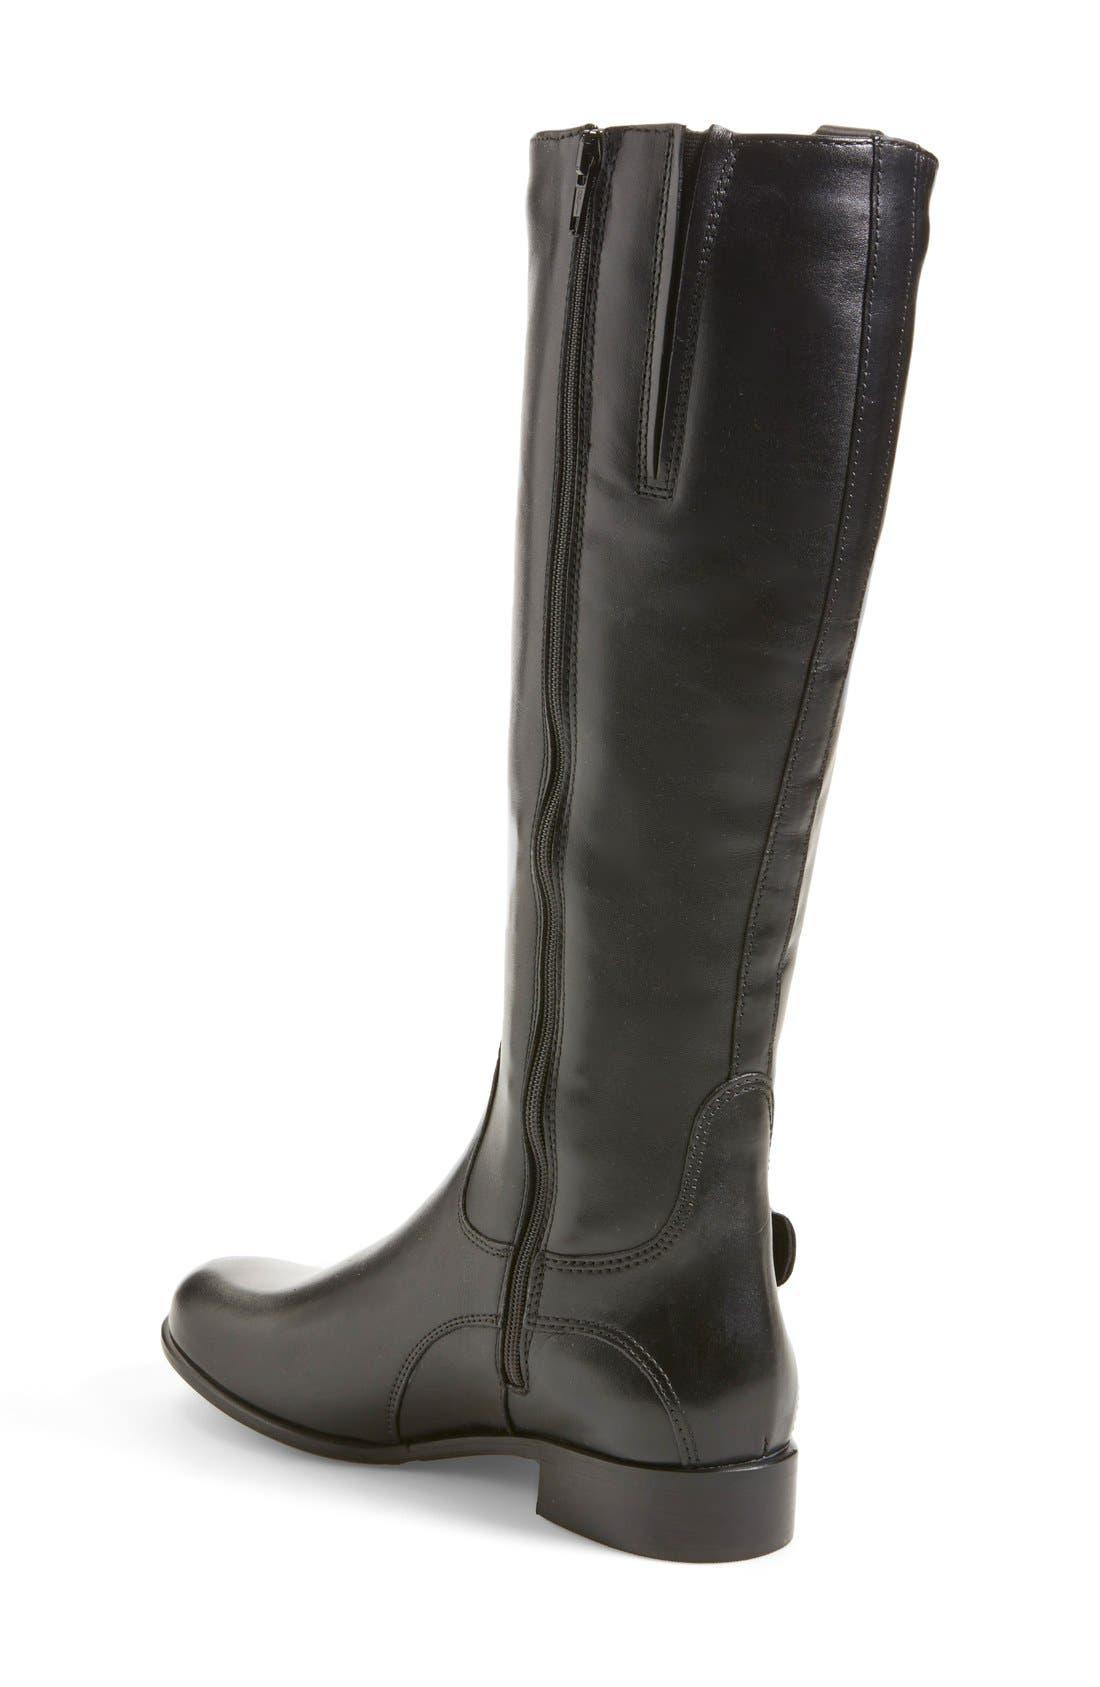 'Stefanie' Waterproof Boot,                             Alternate thumbnail 8, color,                             BLACK LEATHER